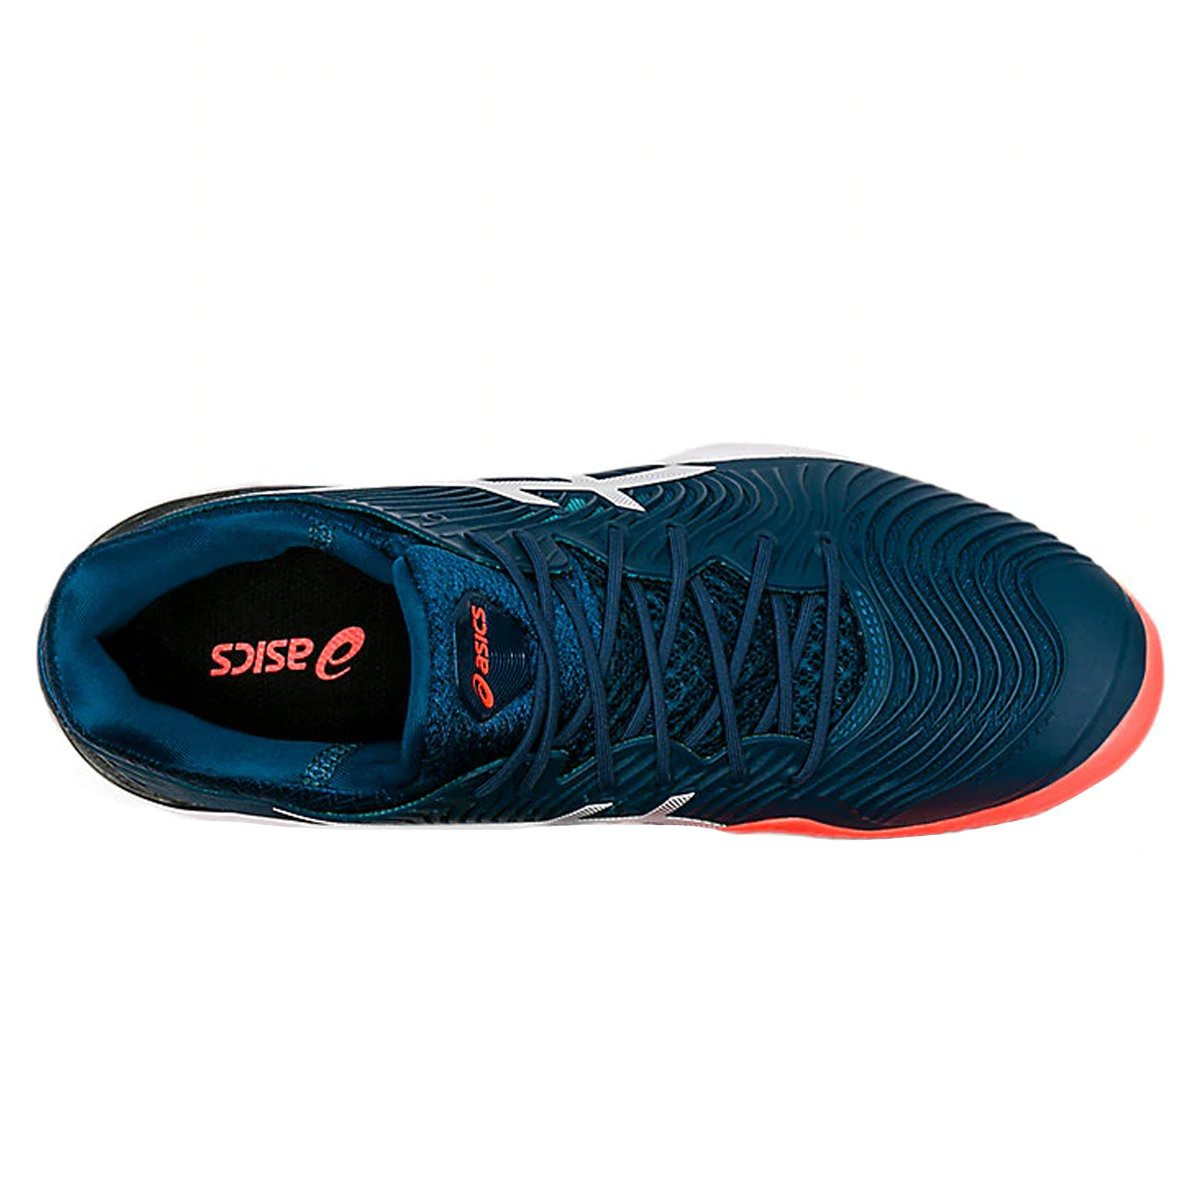 Tenis Asics Gel Court FF Clay Mako Azul